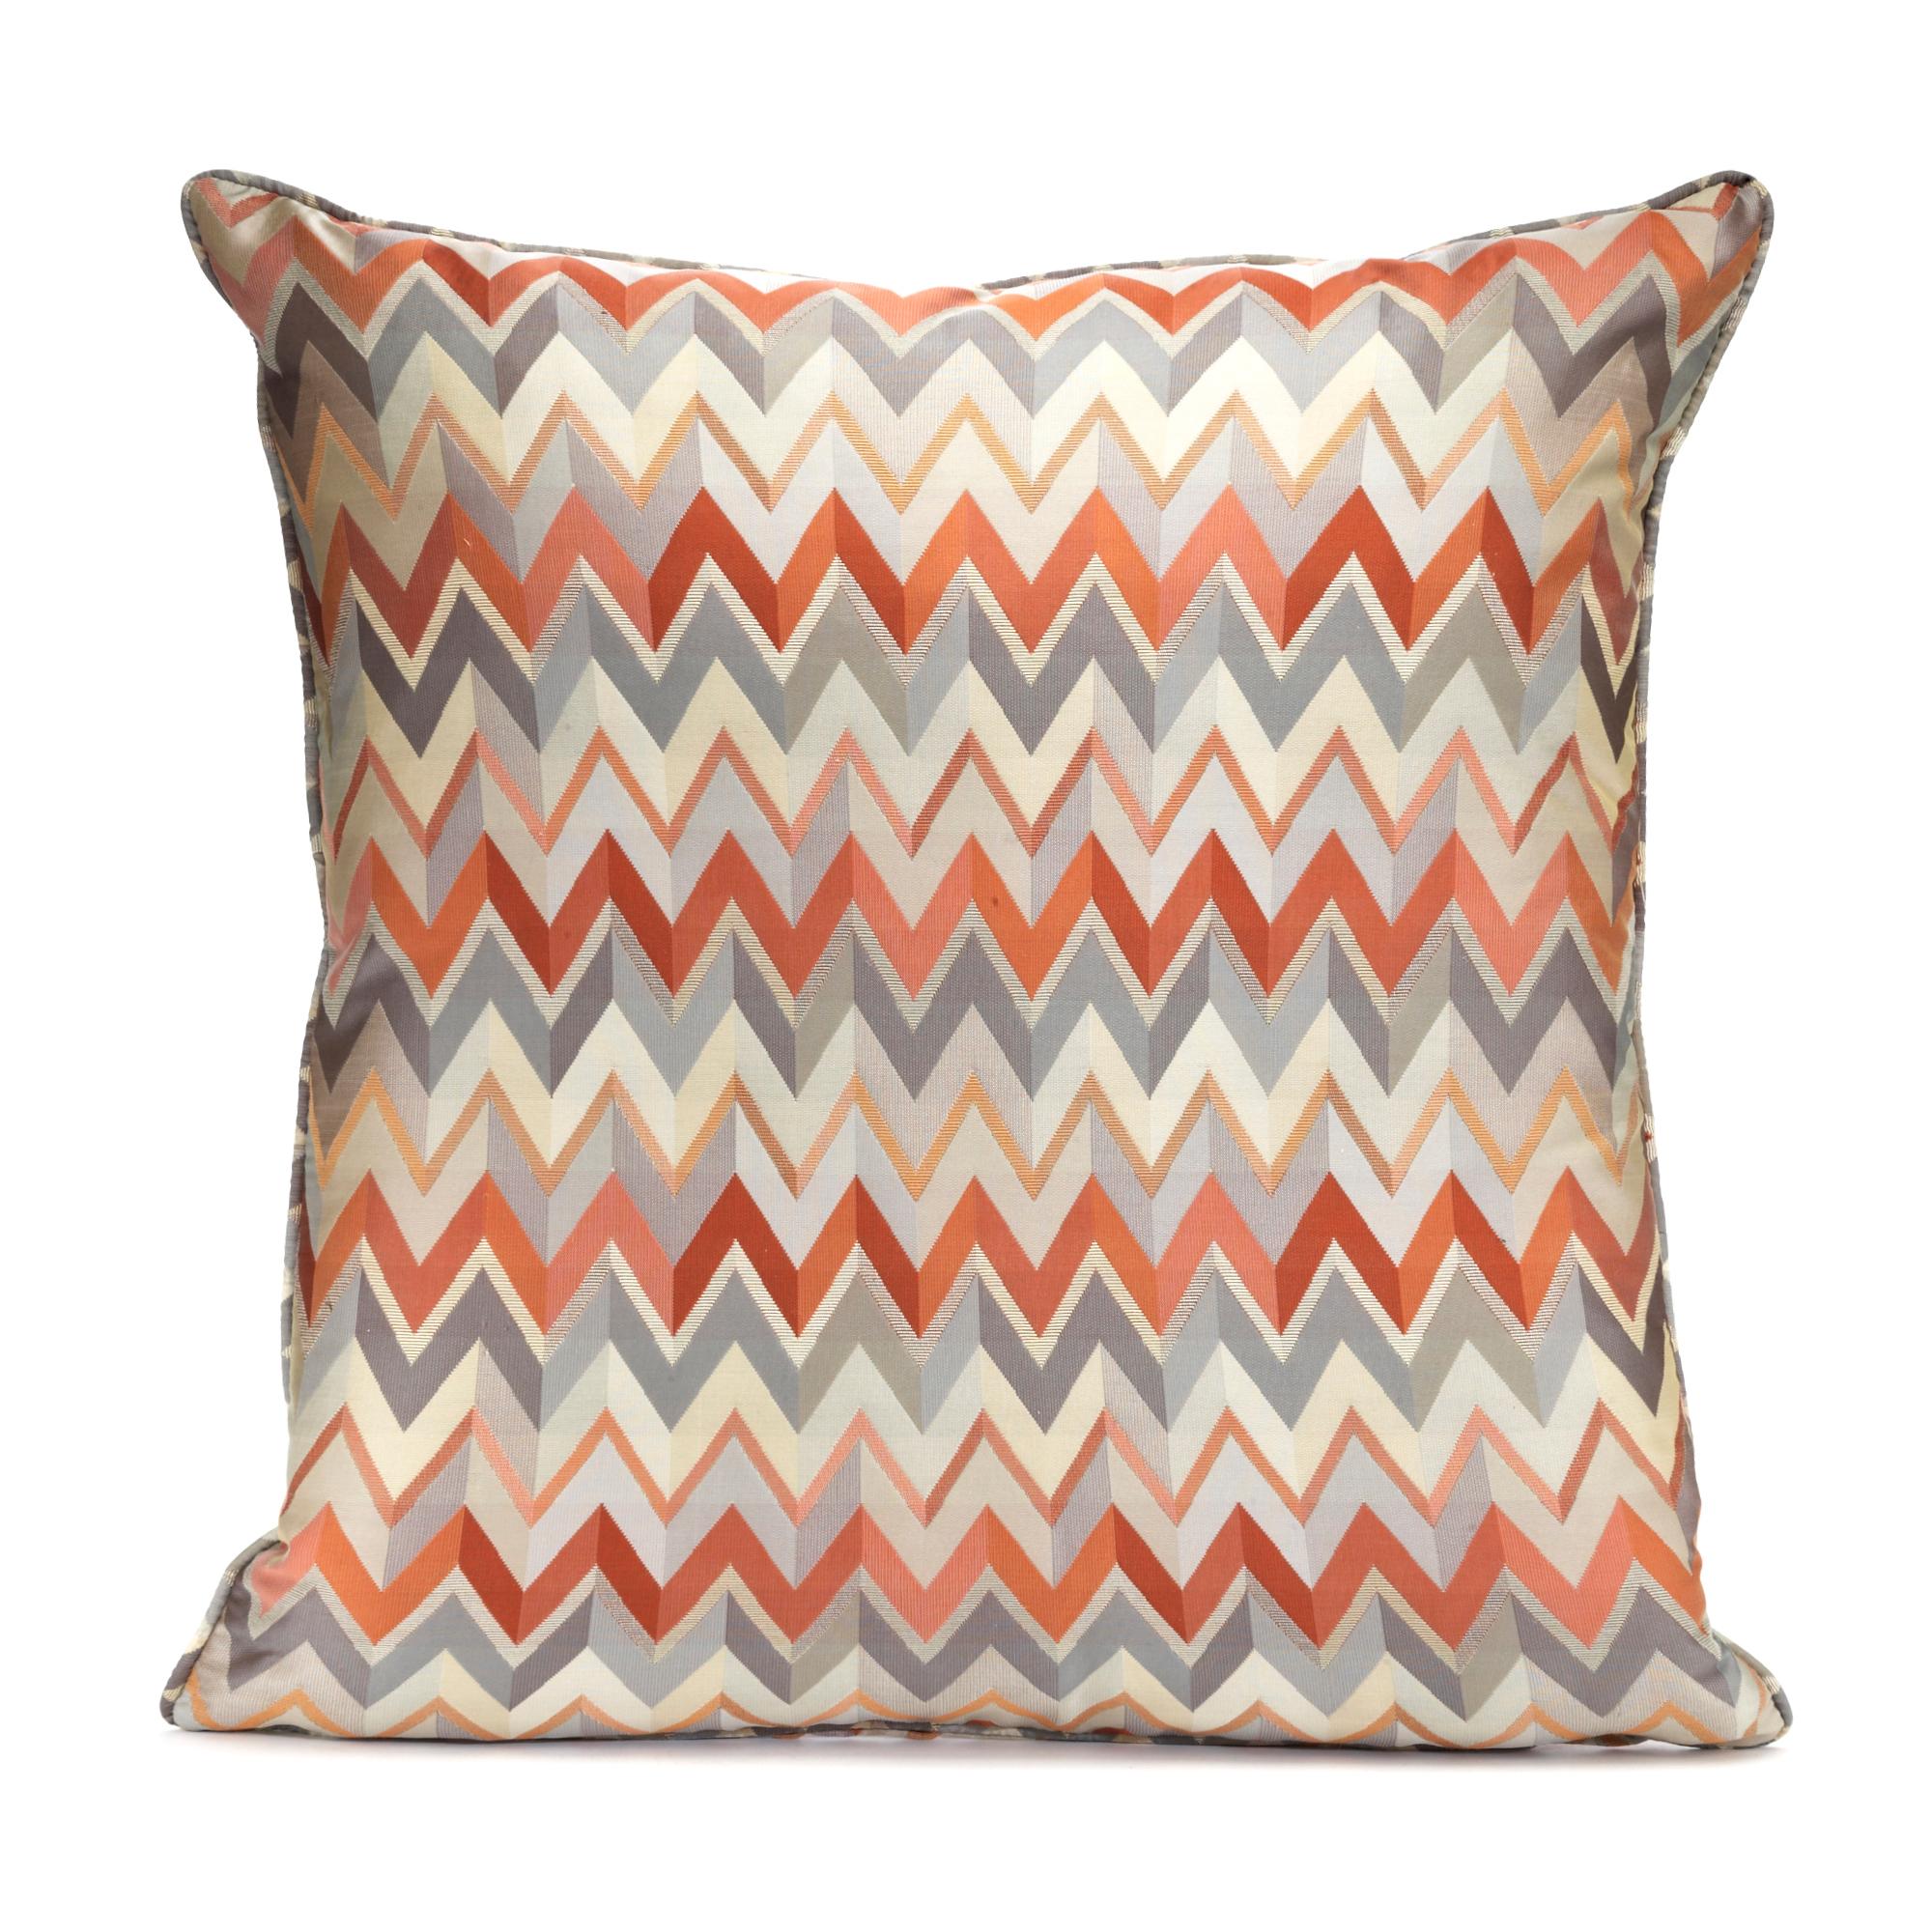 Throw Pillows Home : Zigzag Pillow Gump s